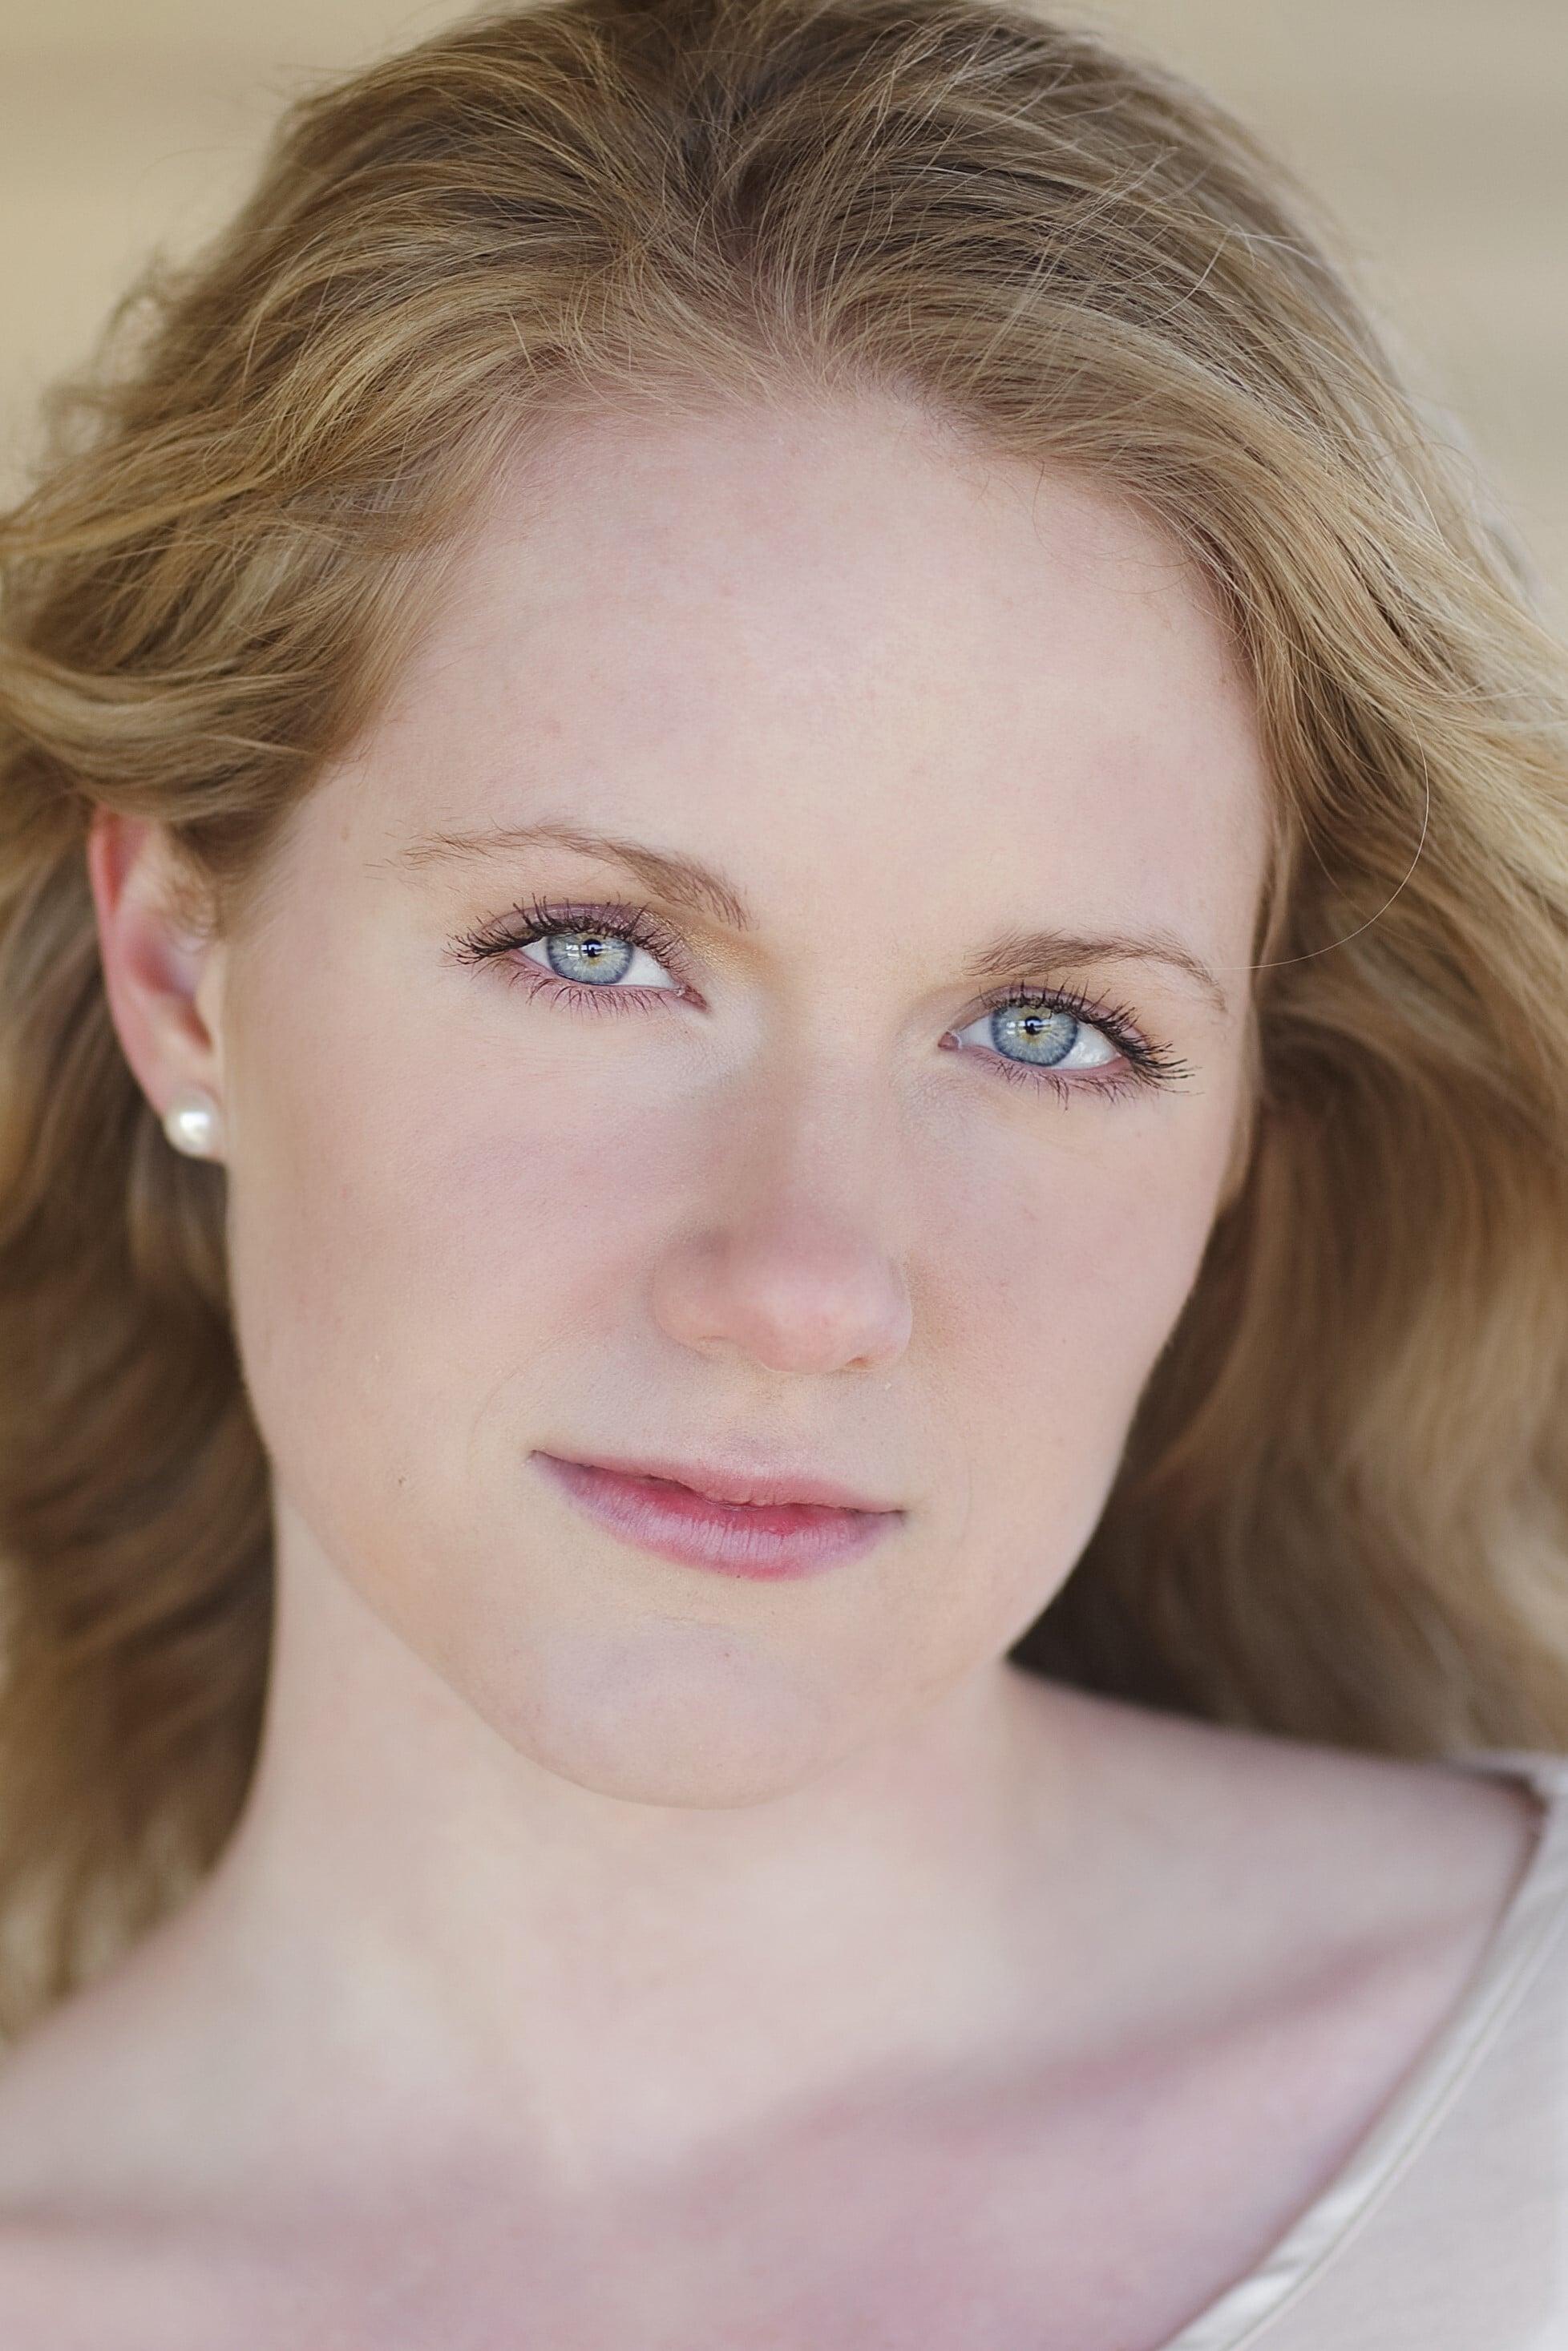 Brooke McCann